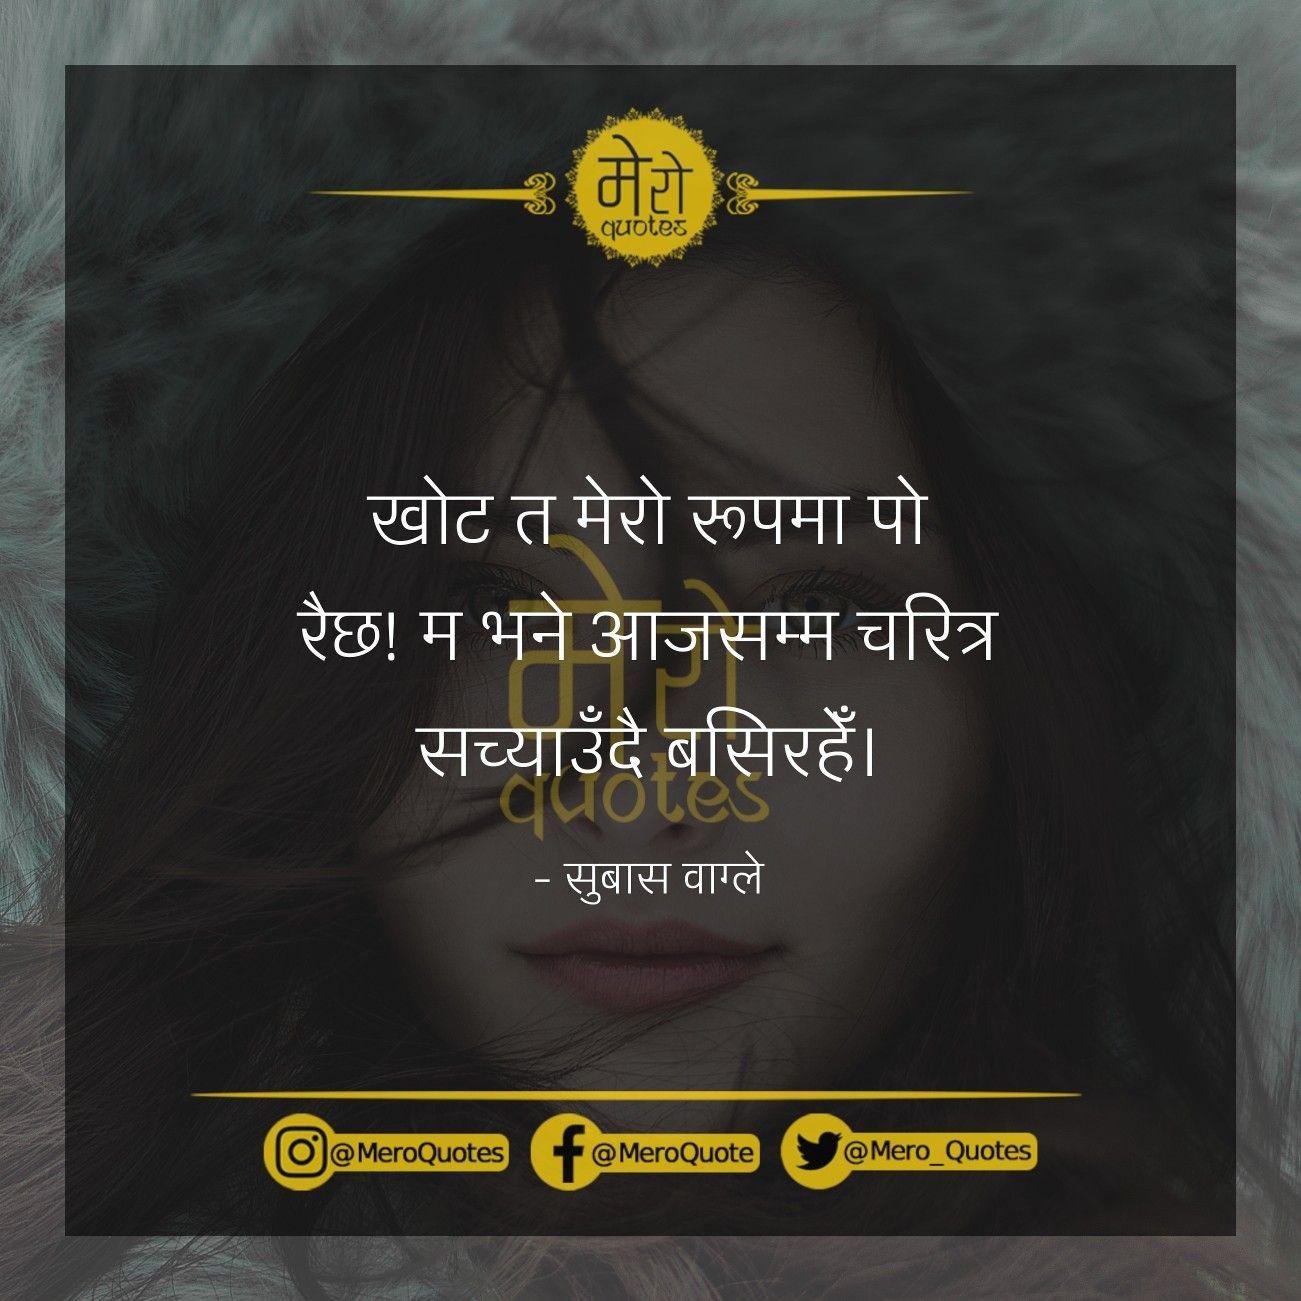 Mero Quotes Nepali Quite Life Quotes Photo Photo And Video